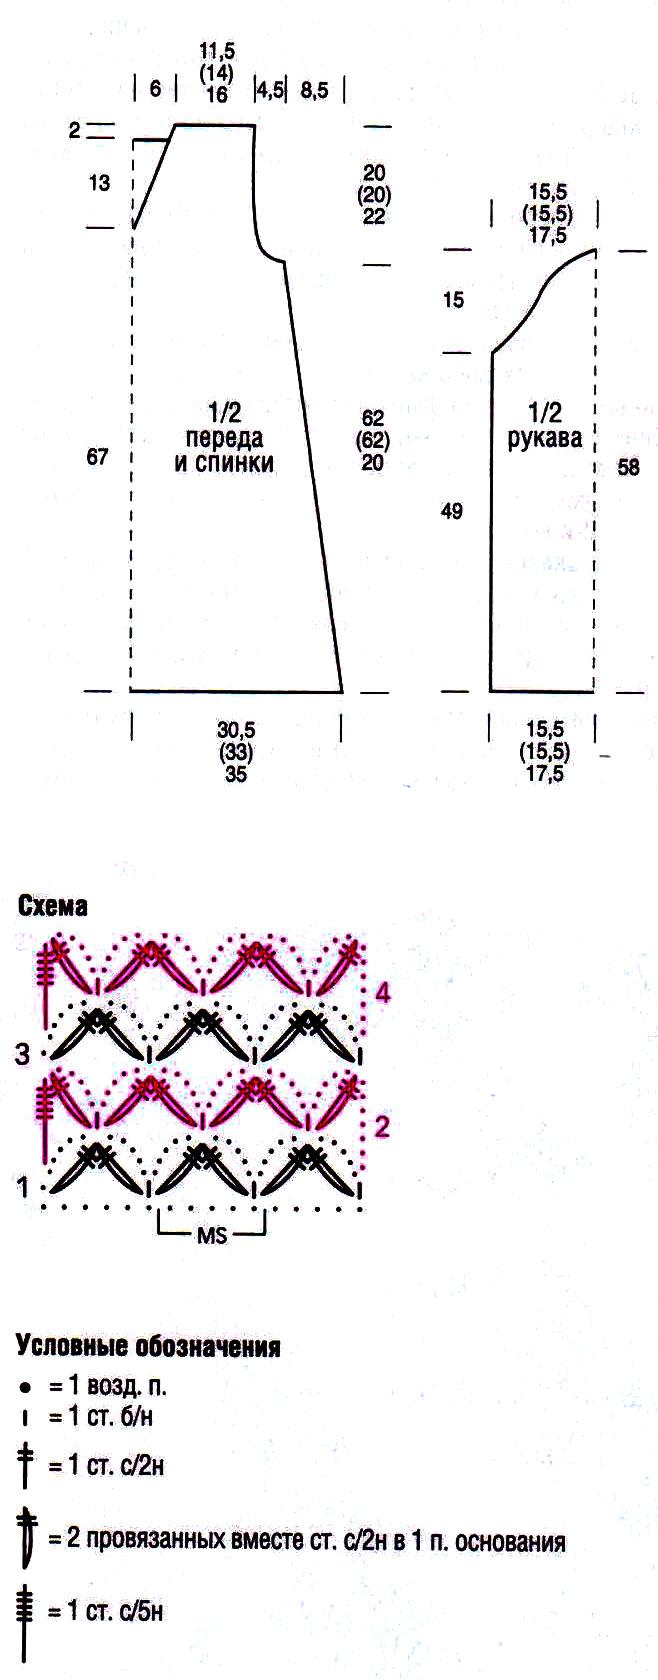 Схема мини-платье